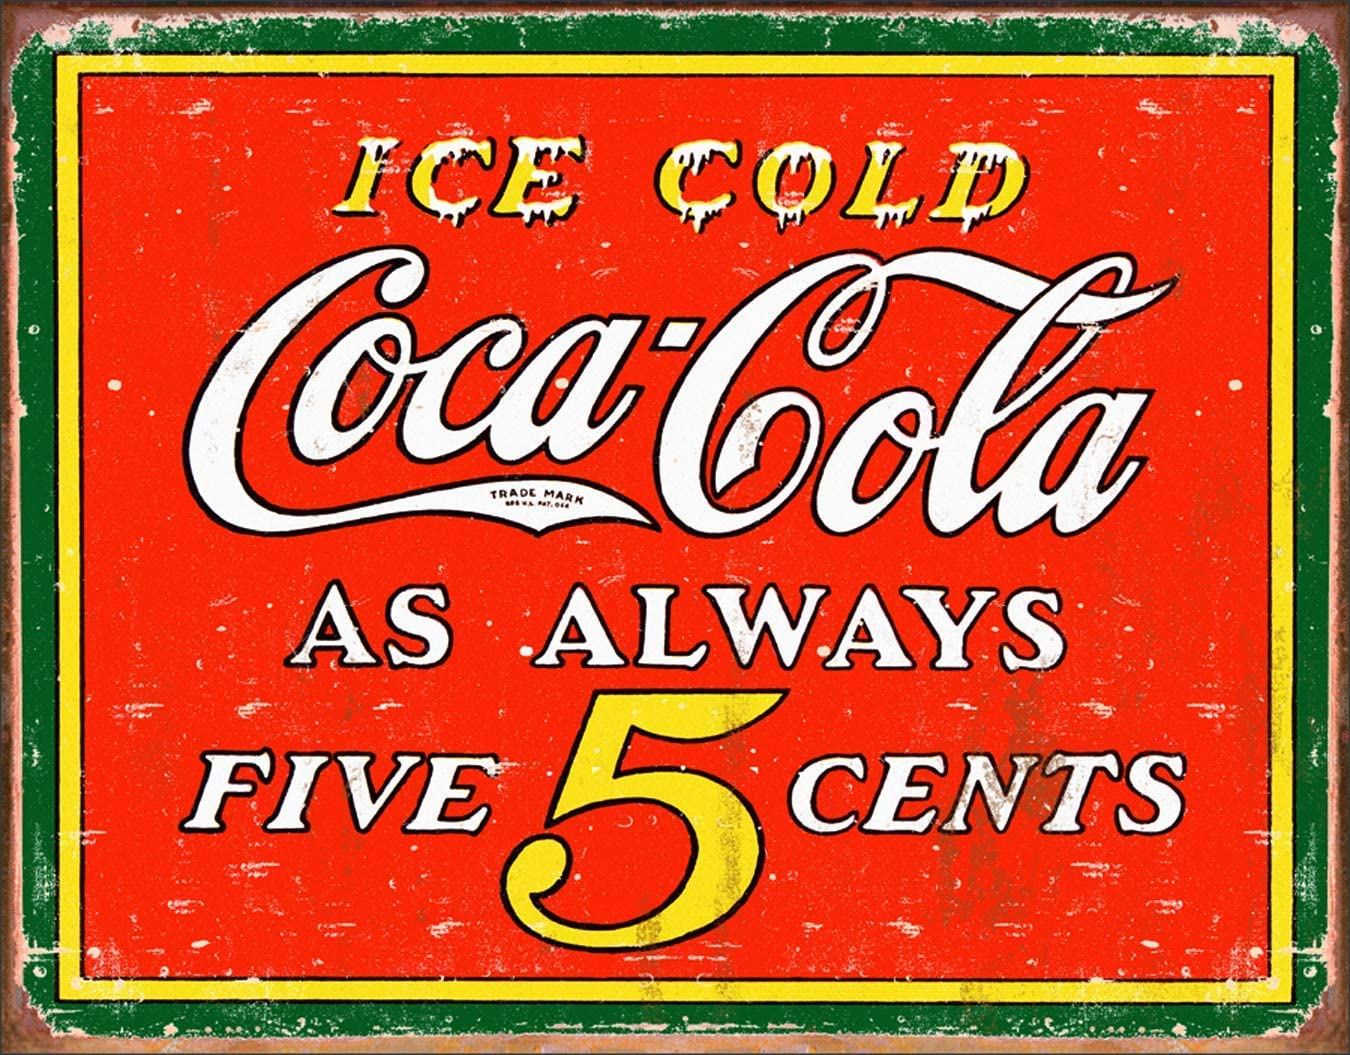 uwuzihuisho Coca-Cola Hot Dog Classico Metallo Targa Vintage Bar Cafe Retro Targa Garage Metallo Decorazioni #1